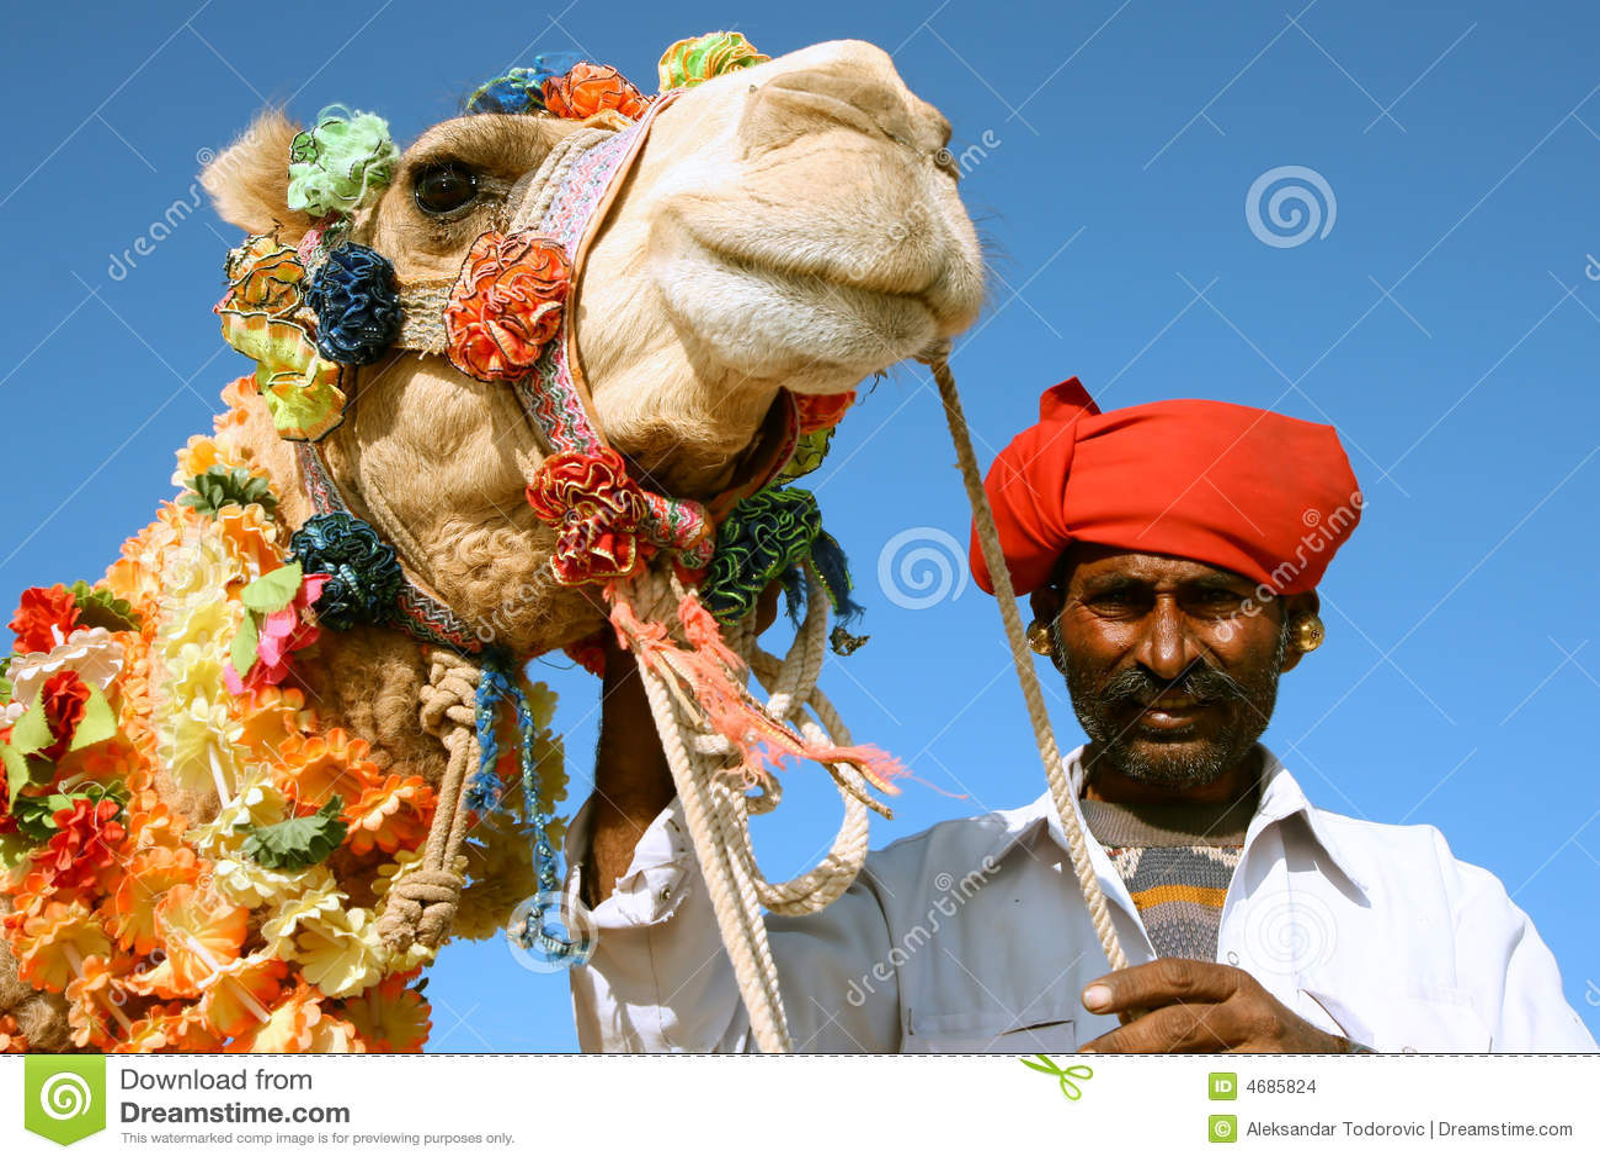 Верблюд на сафари